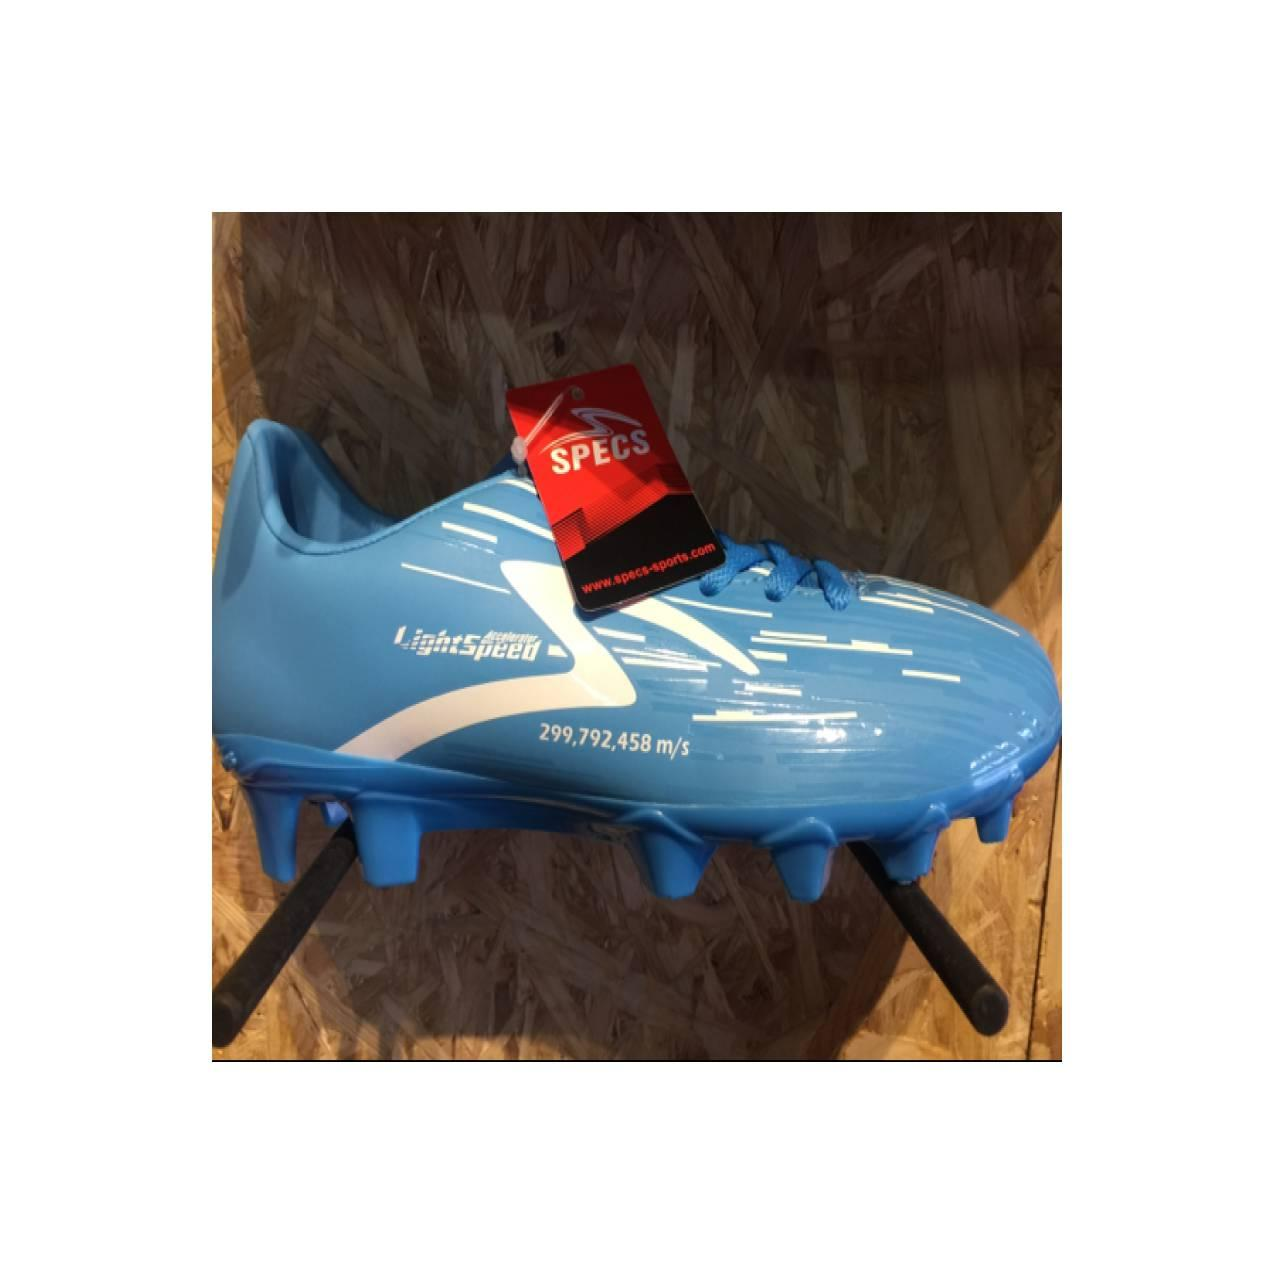 Sepatu bola specs original Accelerator lightspeed jr blue white